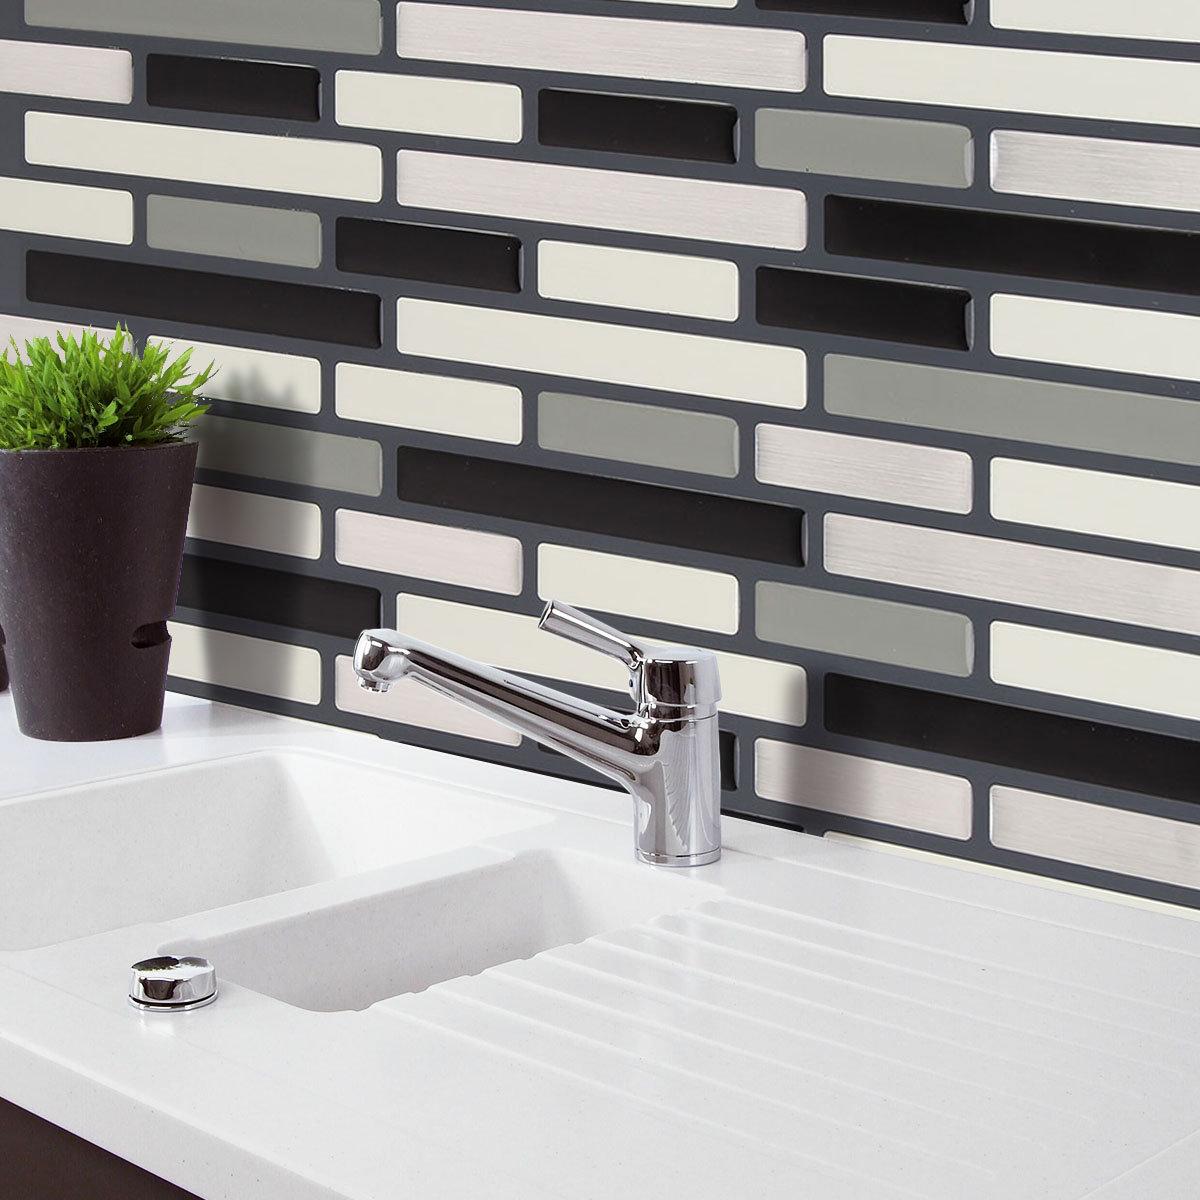 Black&Coffee 3D Mosaic Wall Stickers Backsplash Tile Wallpaper Home ...